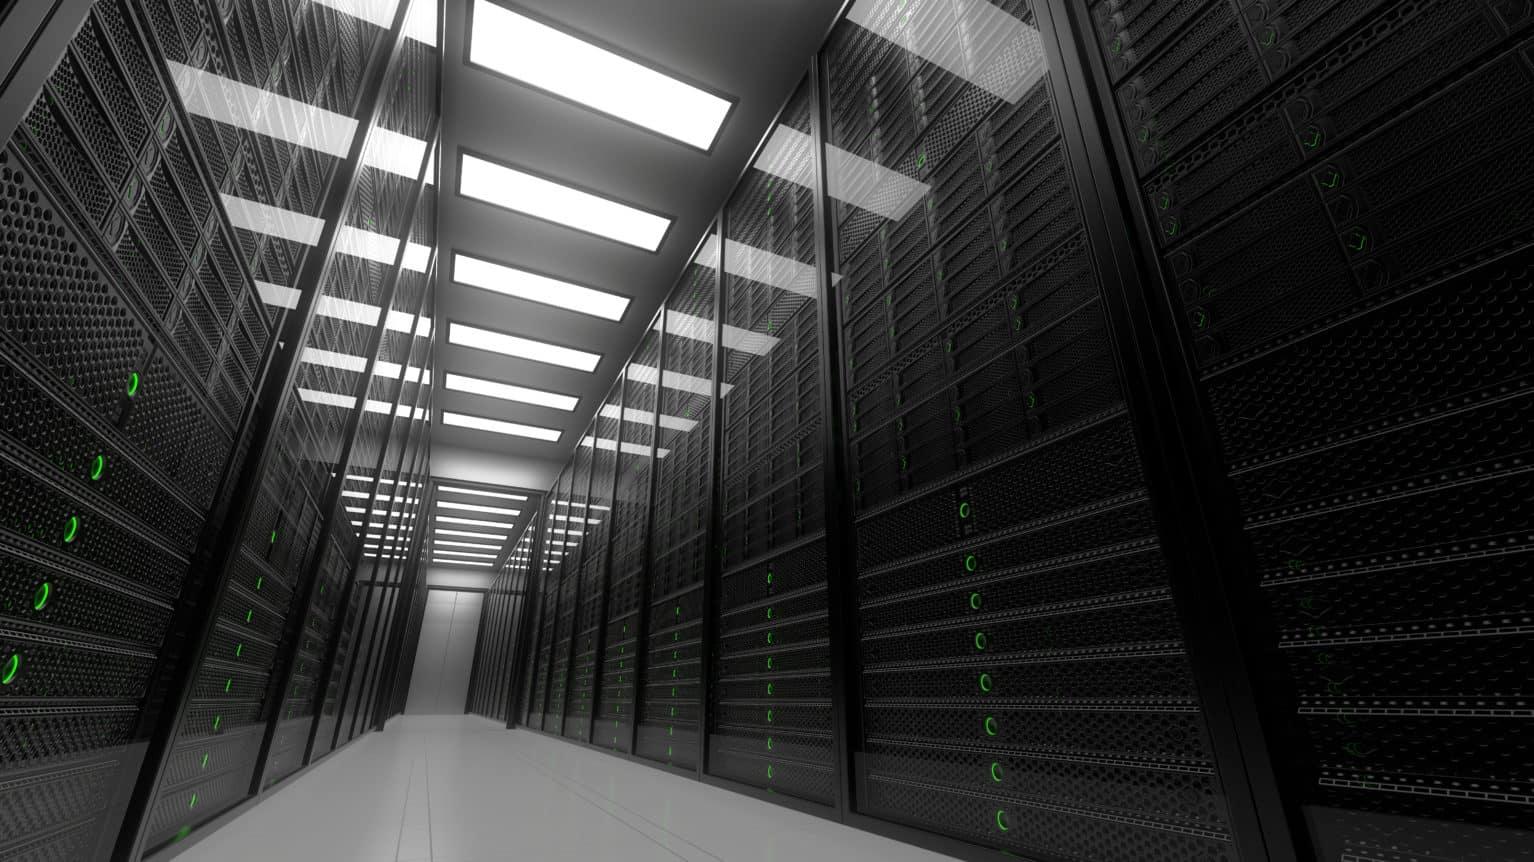 big data server room